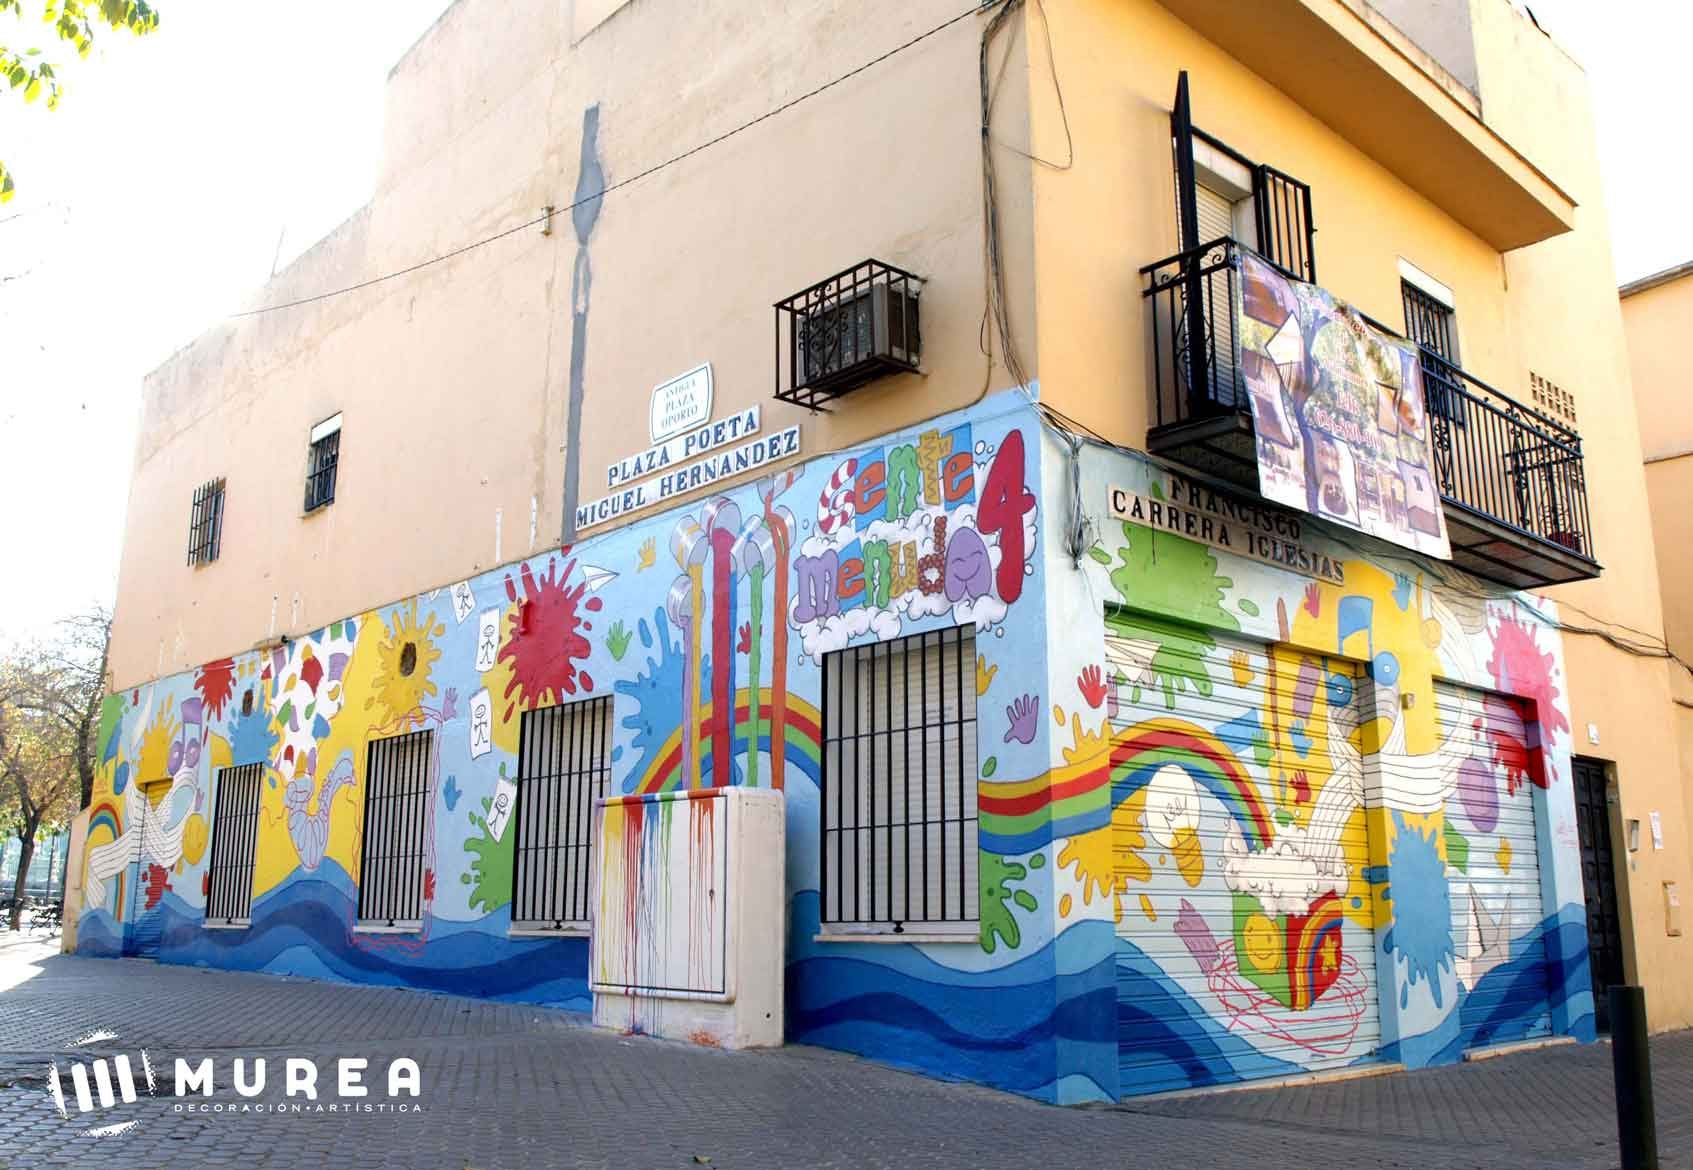 Murales infantiles pintados a mano - Murales infantiles pintados a mano ...